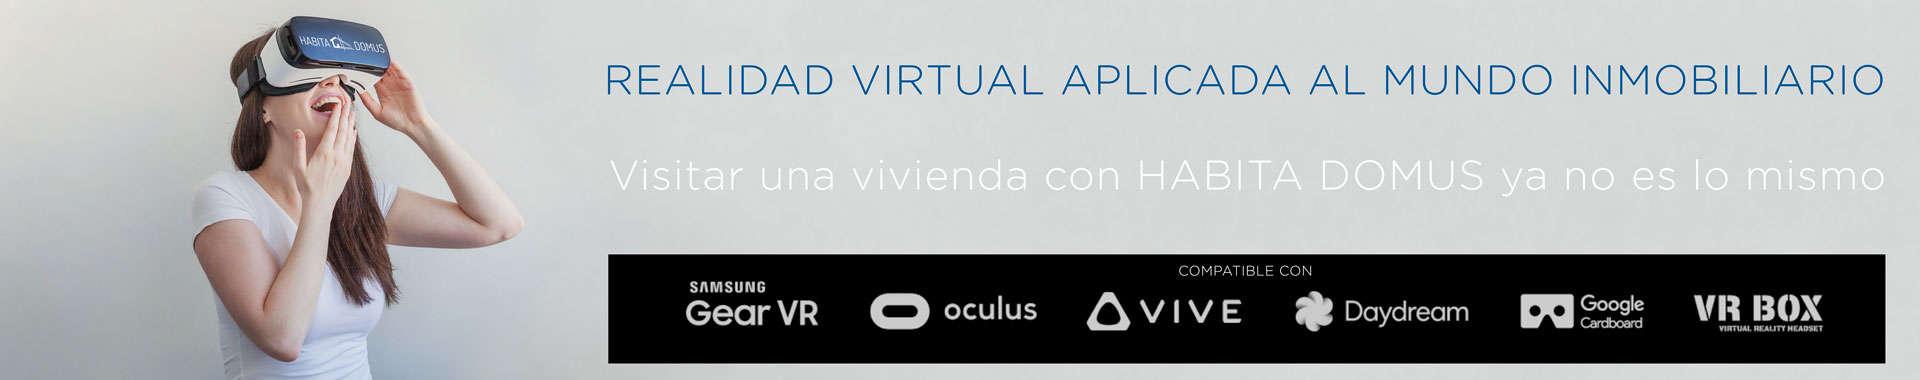 realidad-virtual-habita-domus